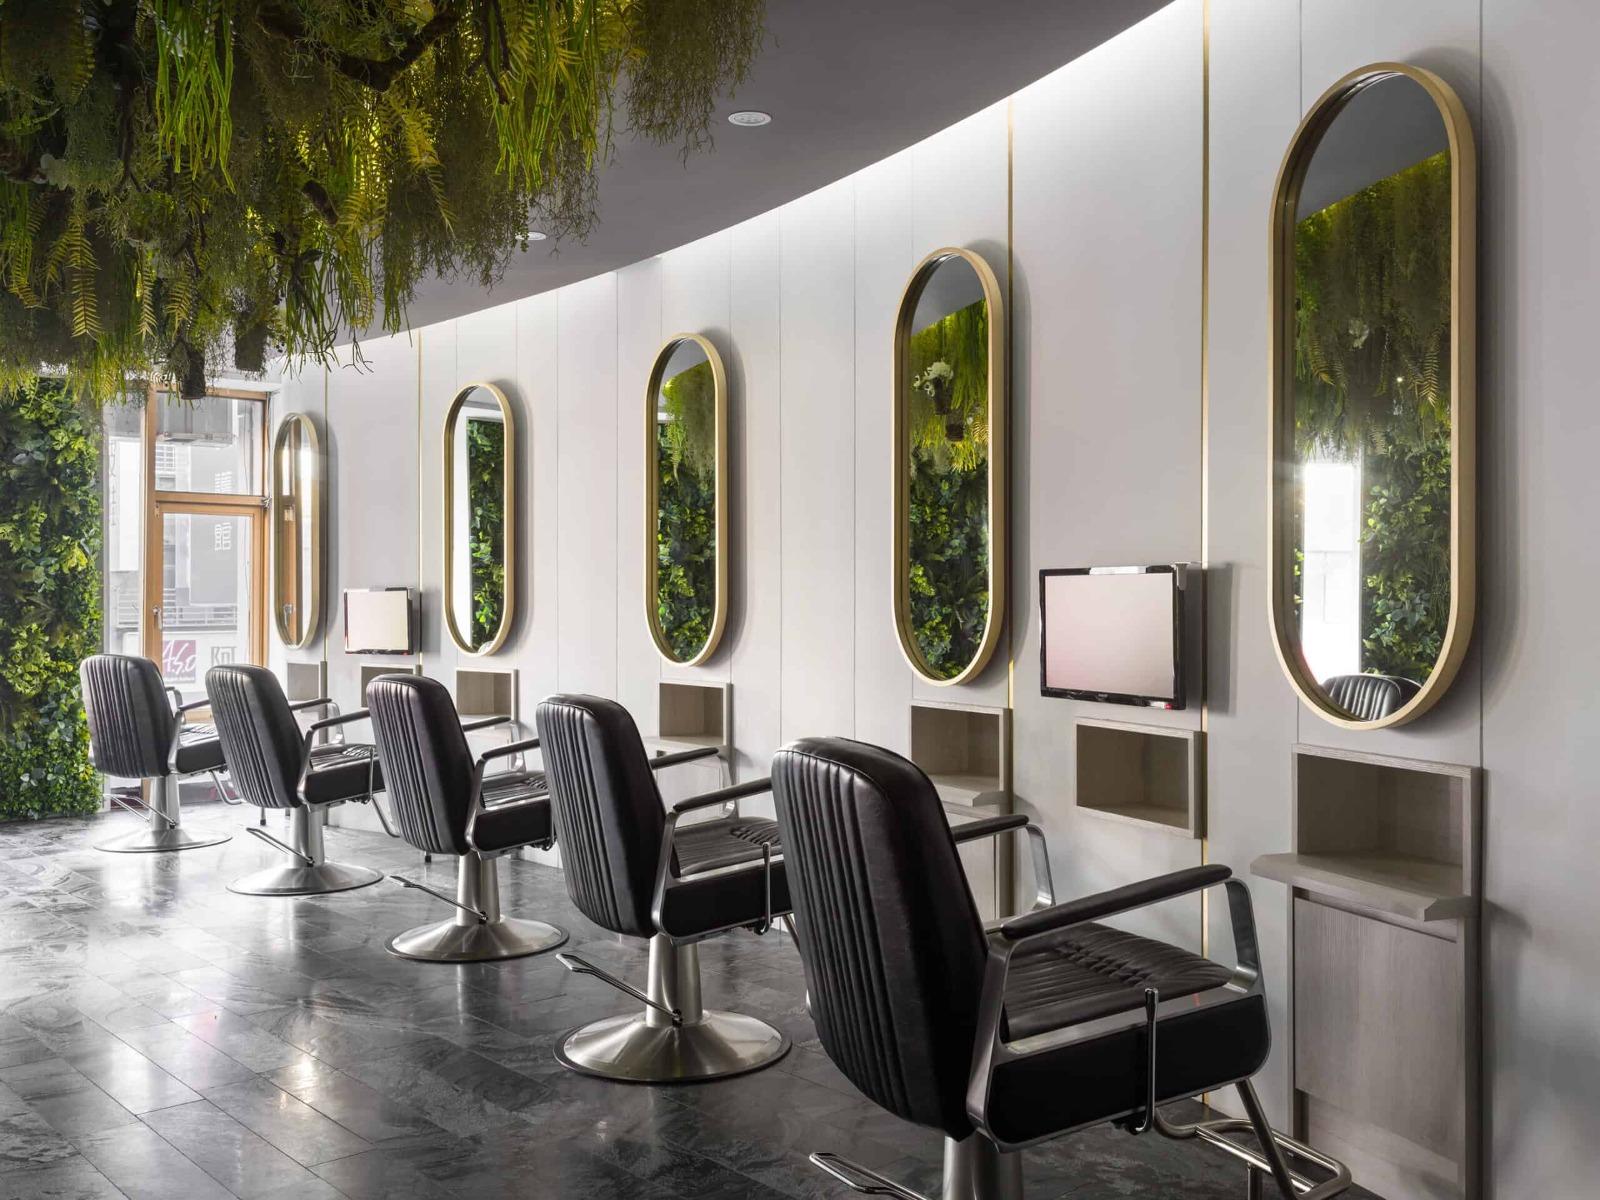 hair-stylist-stations-in-green-modern-salon-scaled.jpg